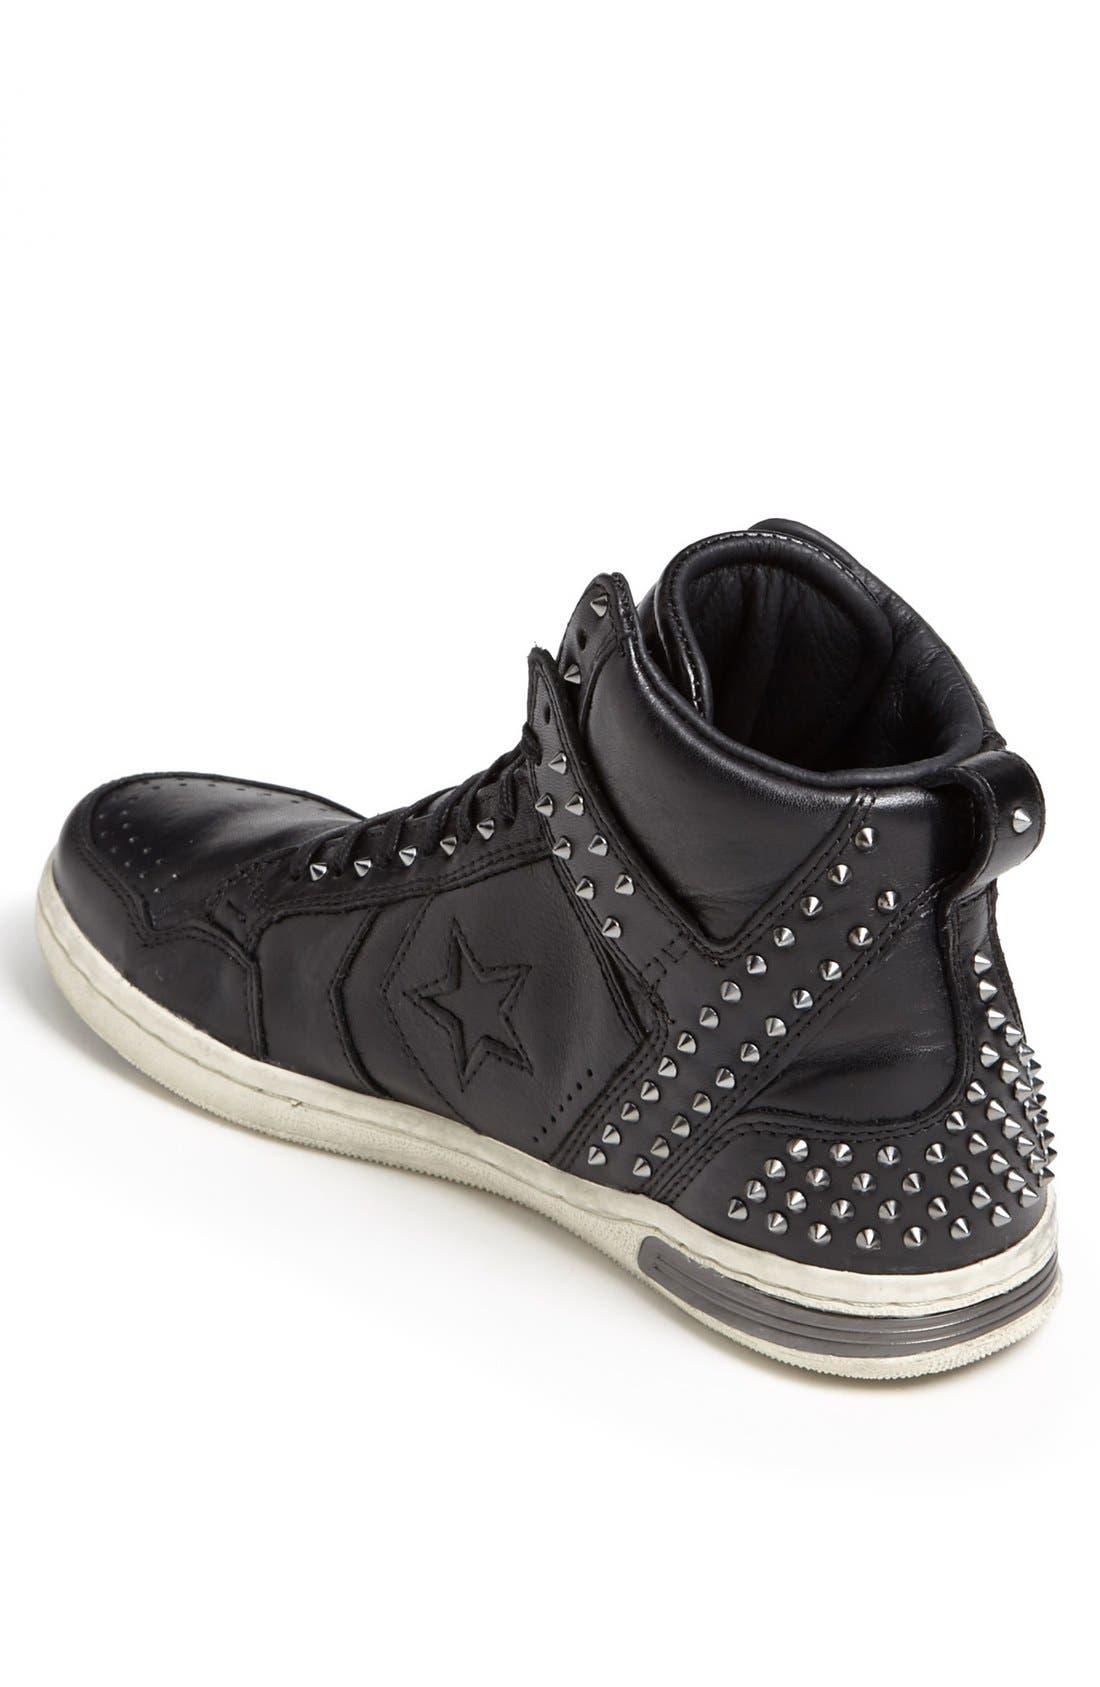 Alternate Image 2  - Converse by John Varvatos 'JV Weapon' Sneaker (Men)